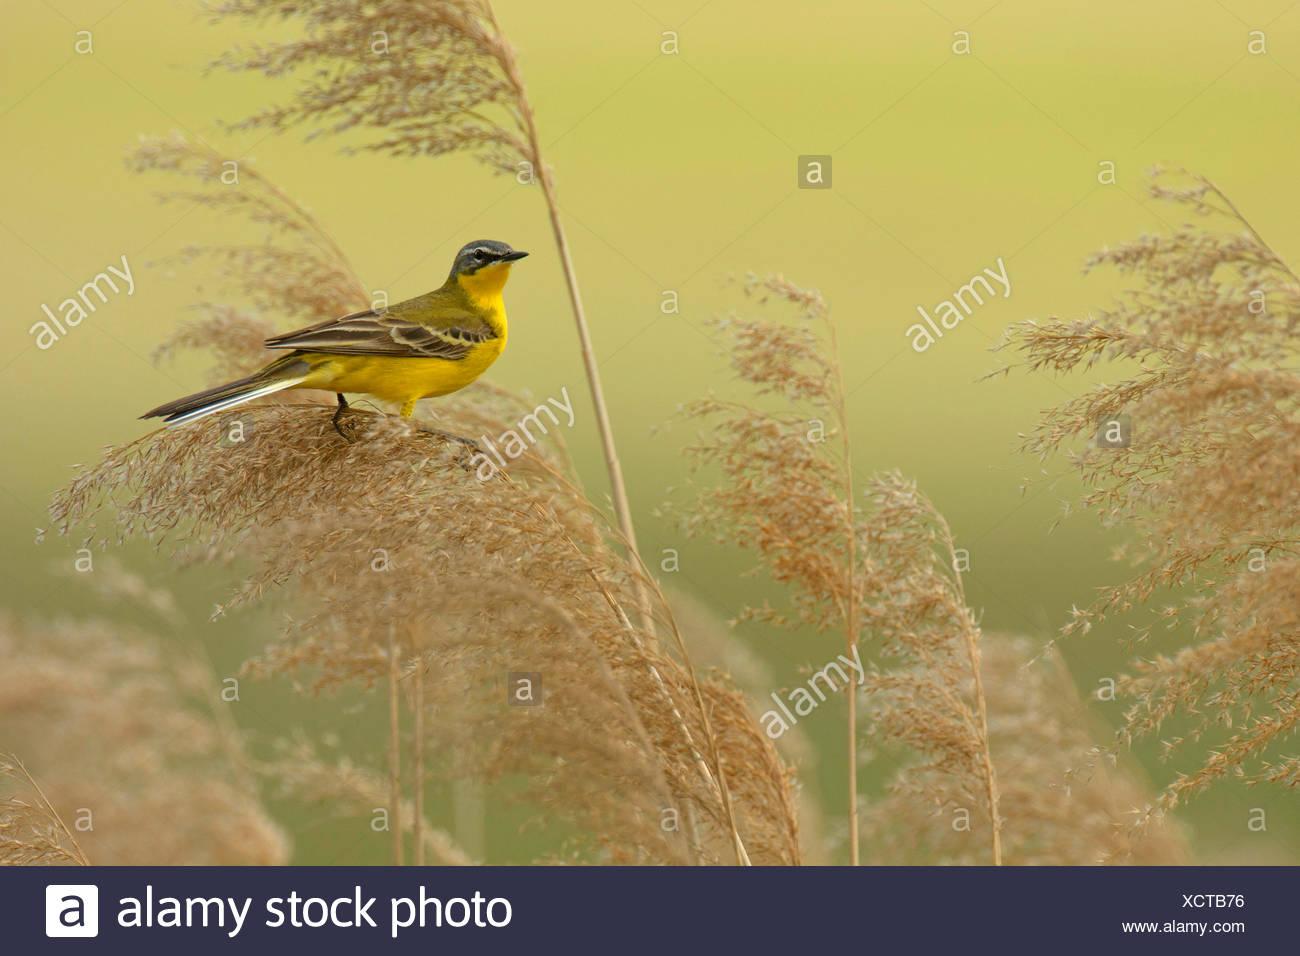 Yellow wagtail (Motacilla flava), sitting on reed, Hungary, Hortobagy, Nagyivan - Stock Image